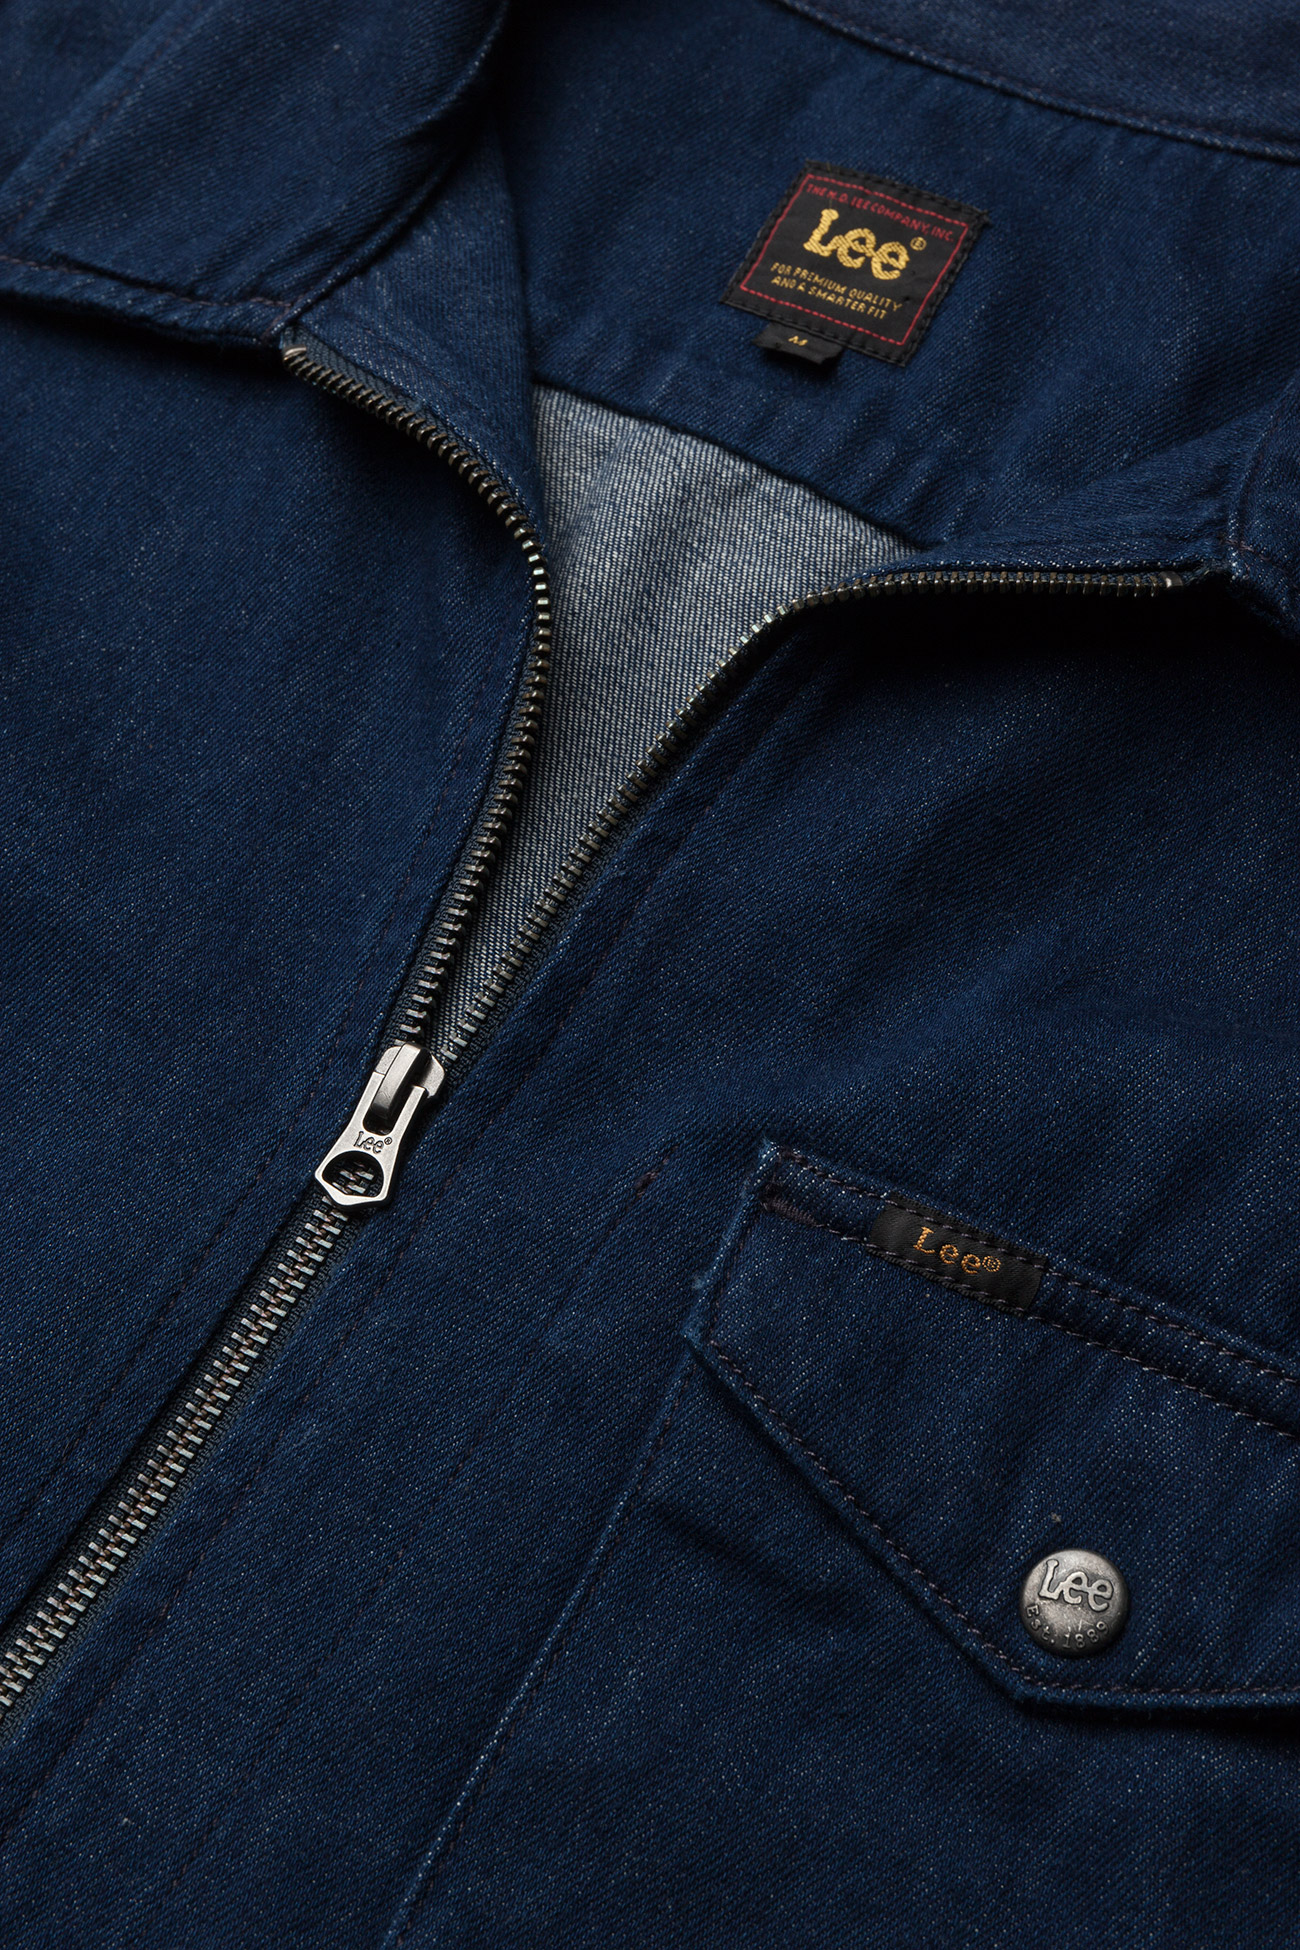 Zip Jeans Zip JacketrinseLee Zip Jeans JacketrinseLee JacketrinseLee JacketrinseLee Jeans Zip Jeans 7bf6gvYy